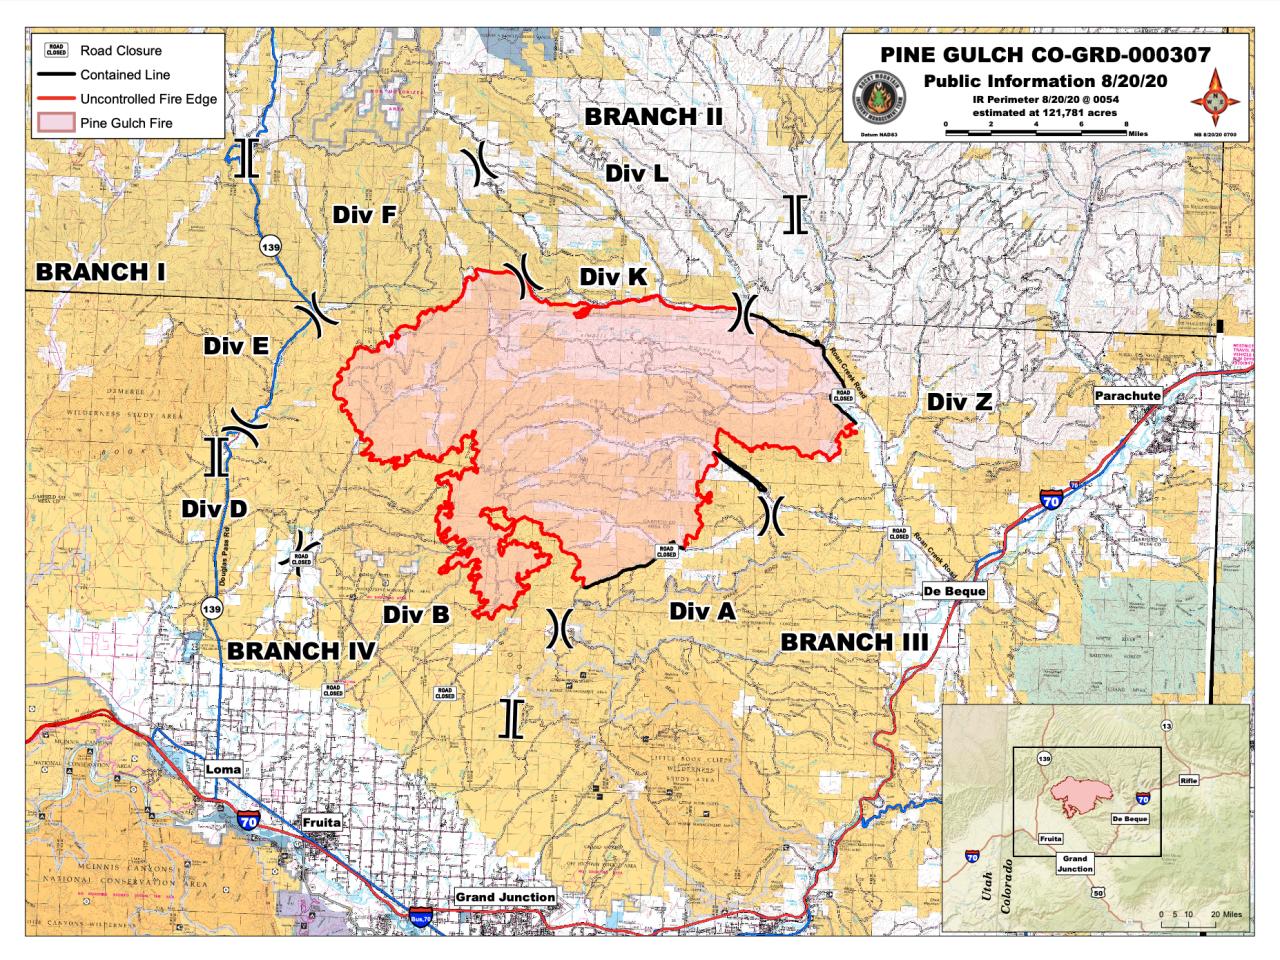 Pine Gulch Fire map_Aug 20 2020